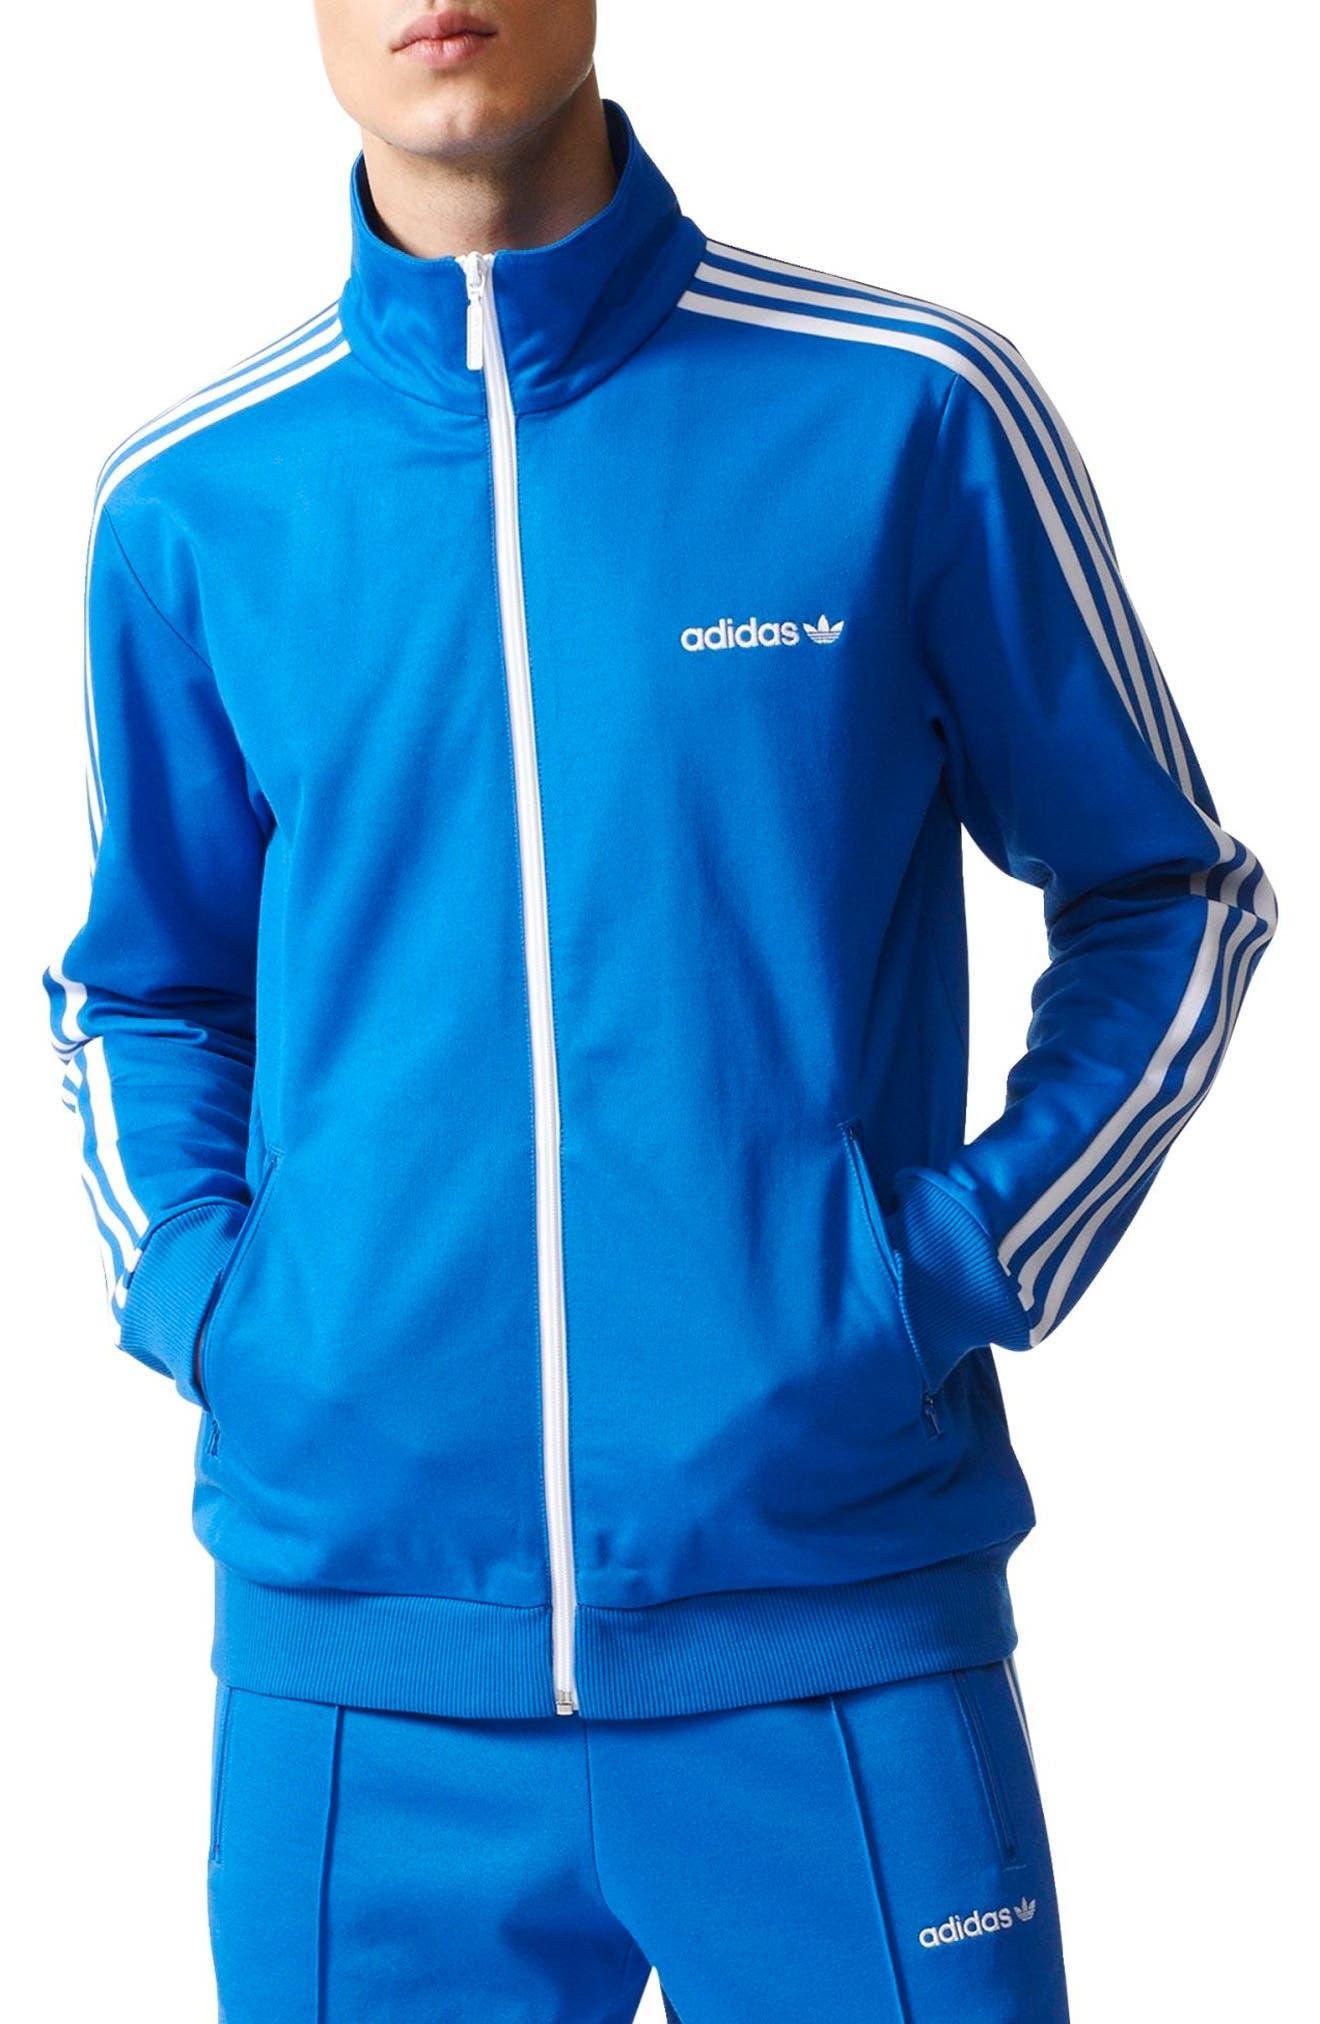 adidas Beckenbauer Track Jacket